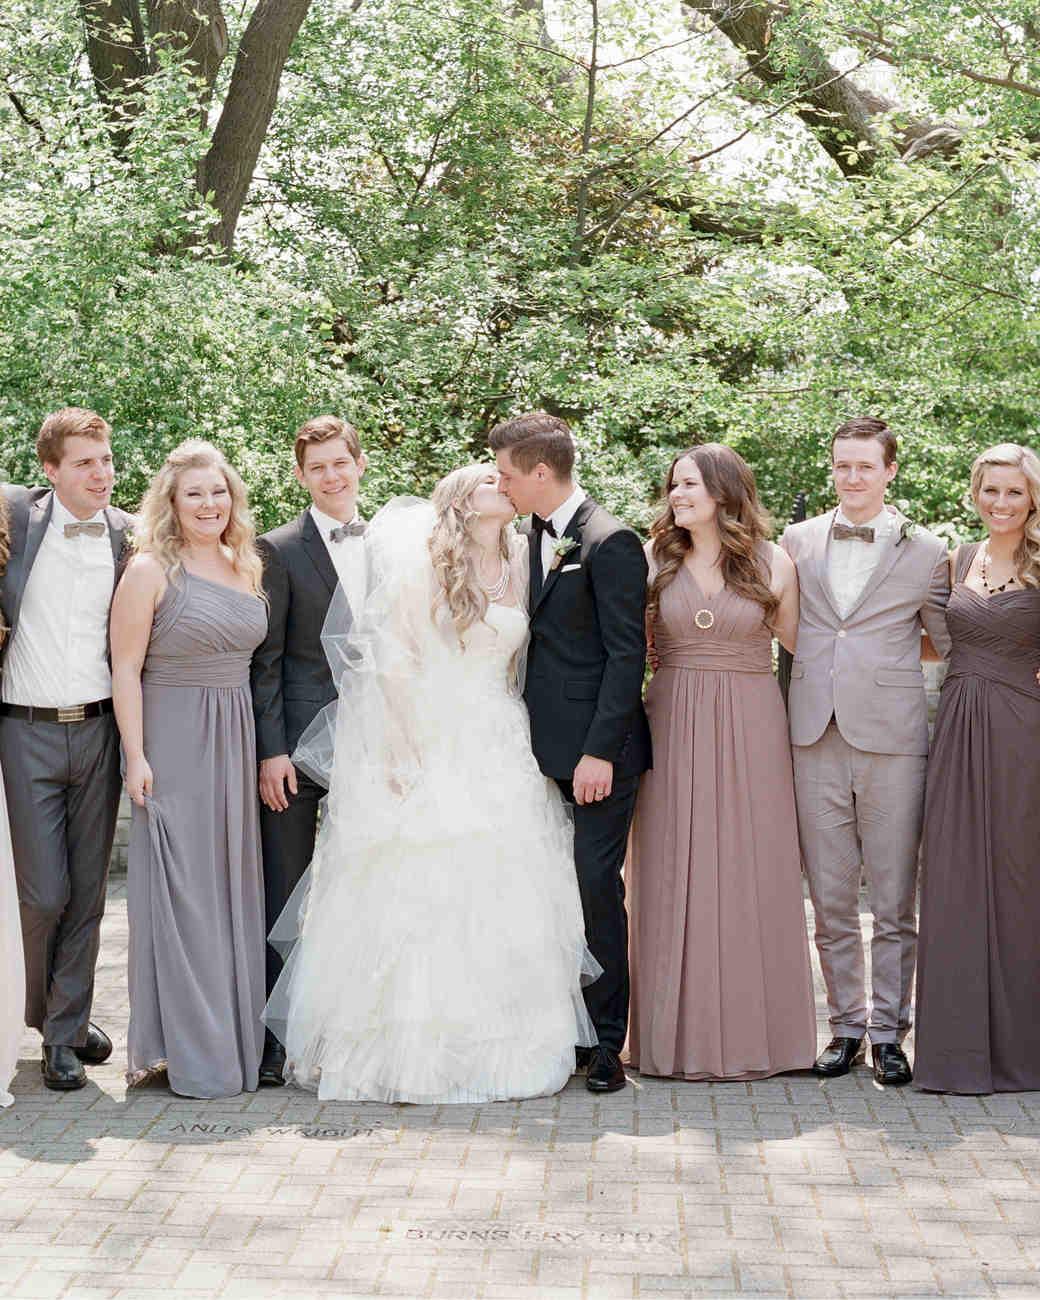 brittany-jeff-wedding-bridalparty-082-s111415-0714.jpg